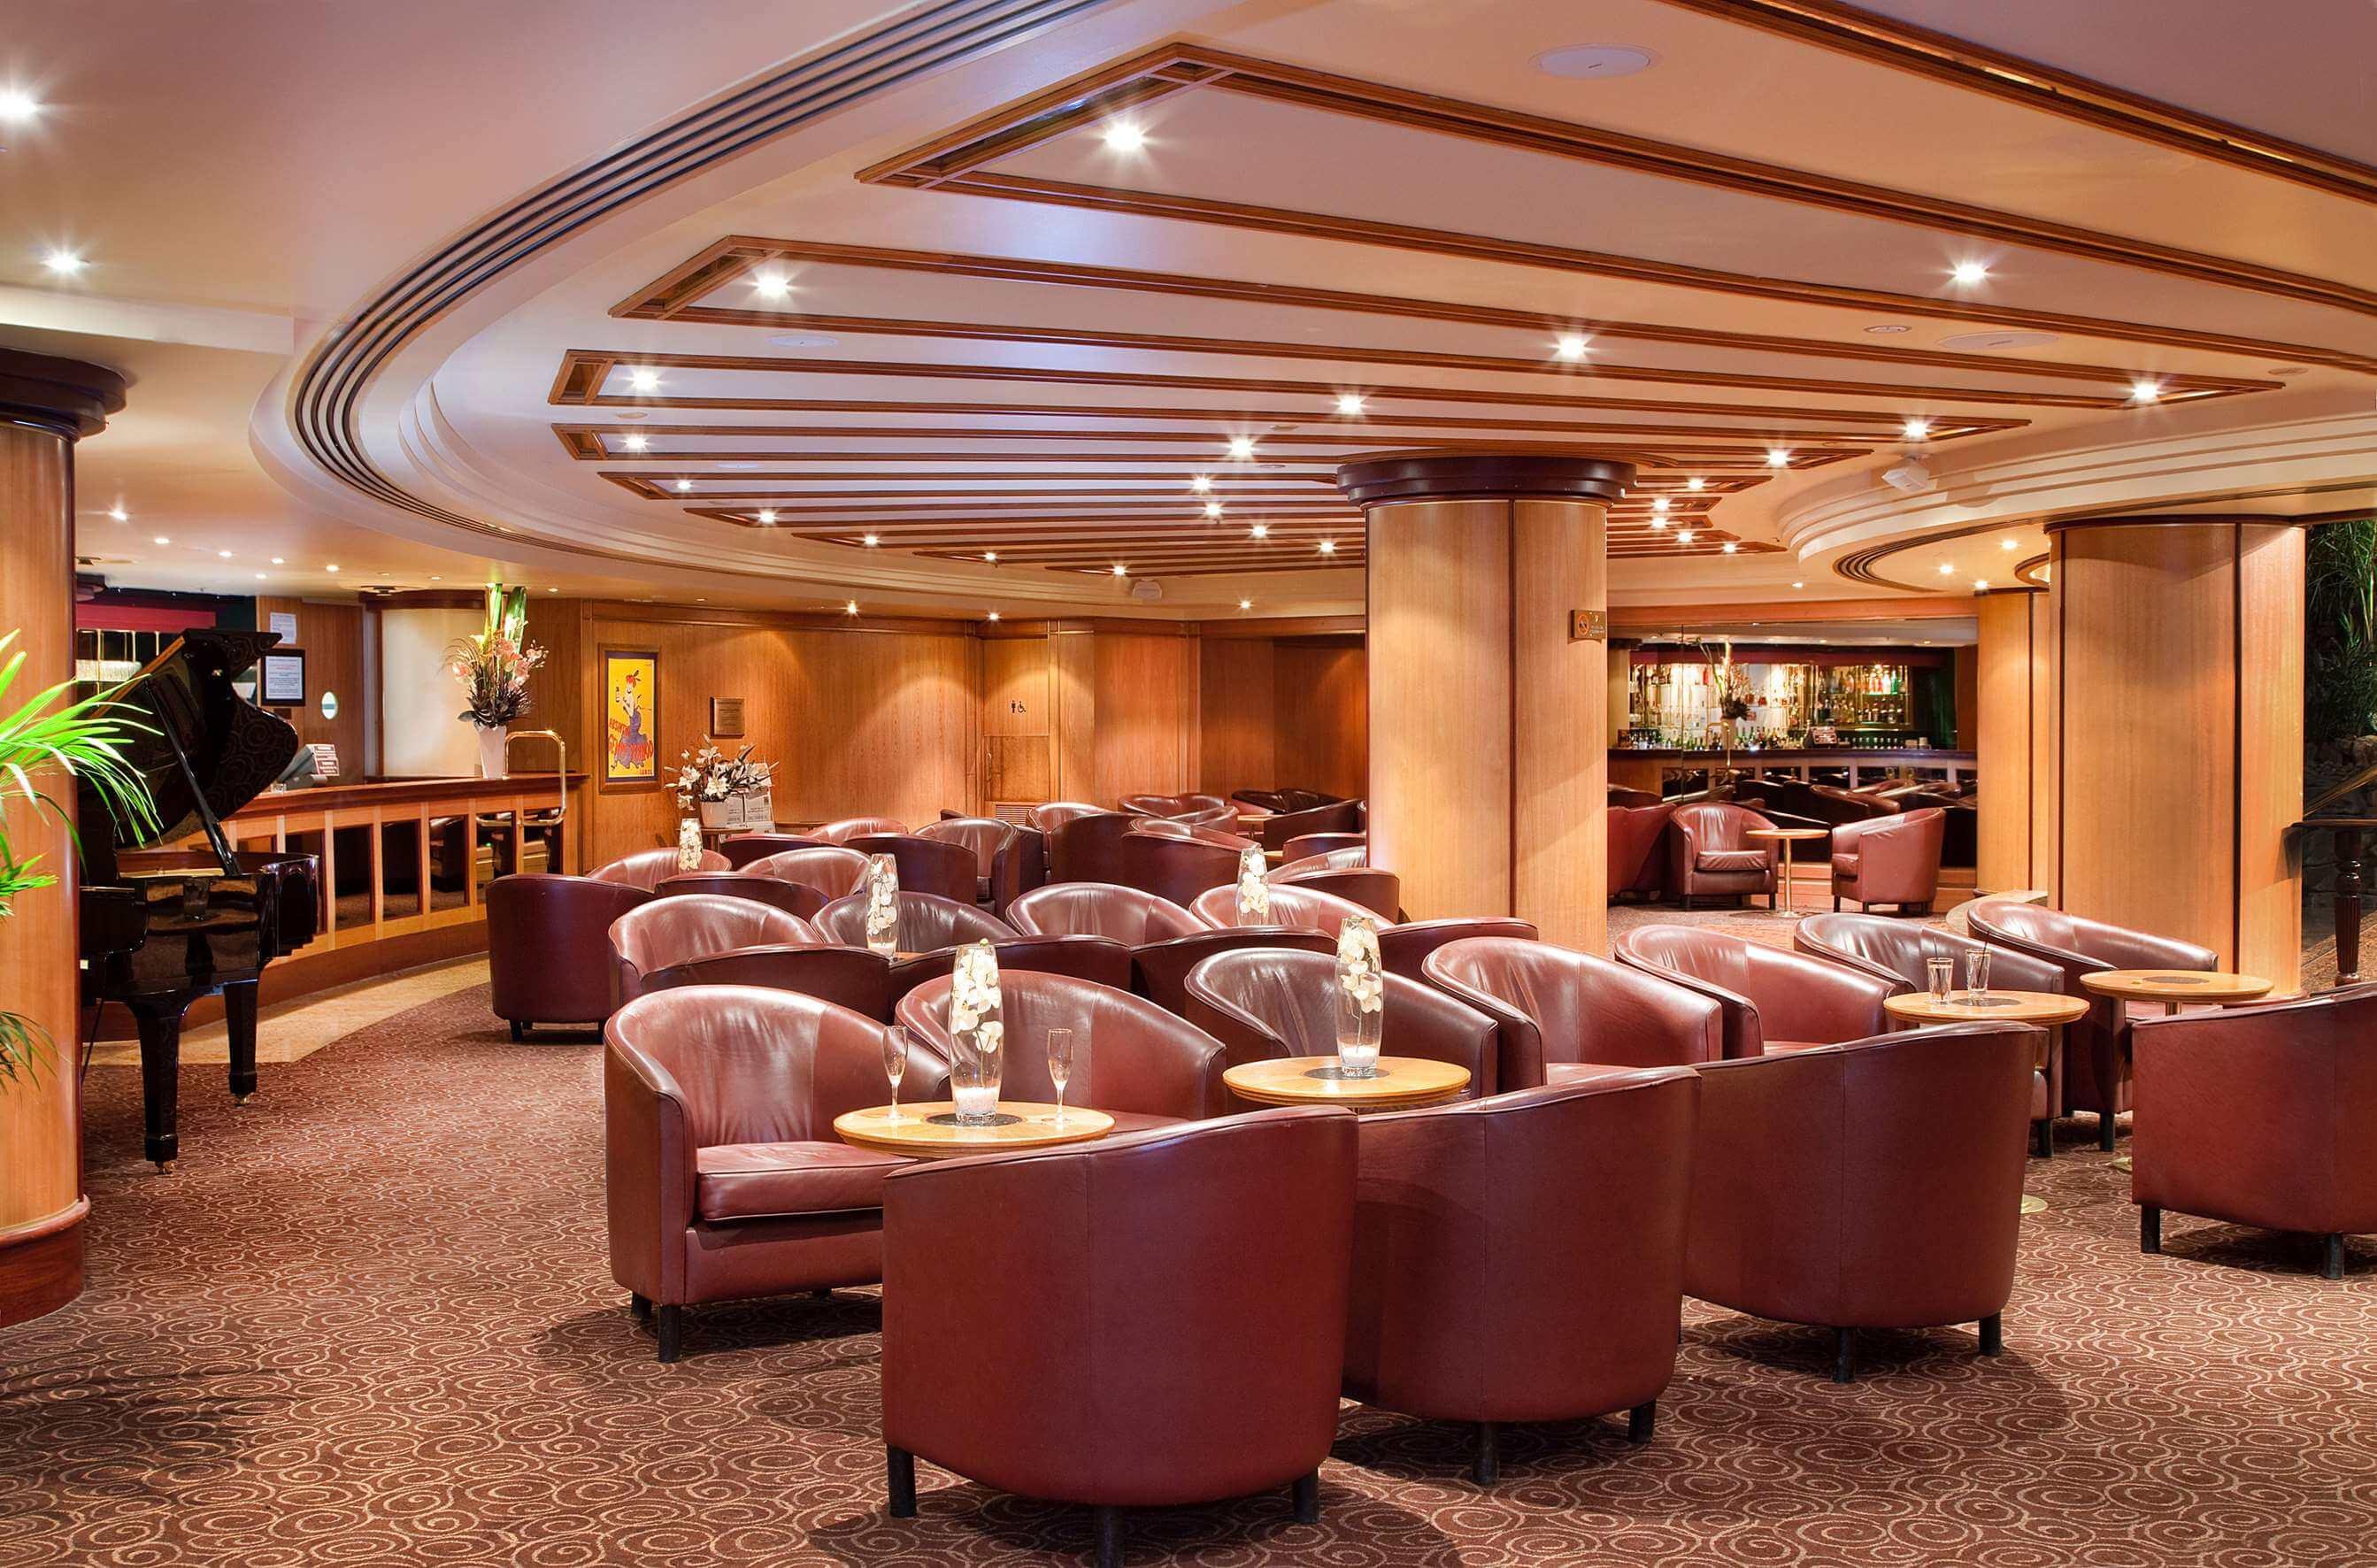 Stamford Plaza Adelaide lobby lounge